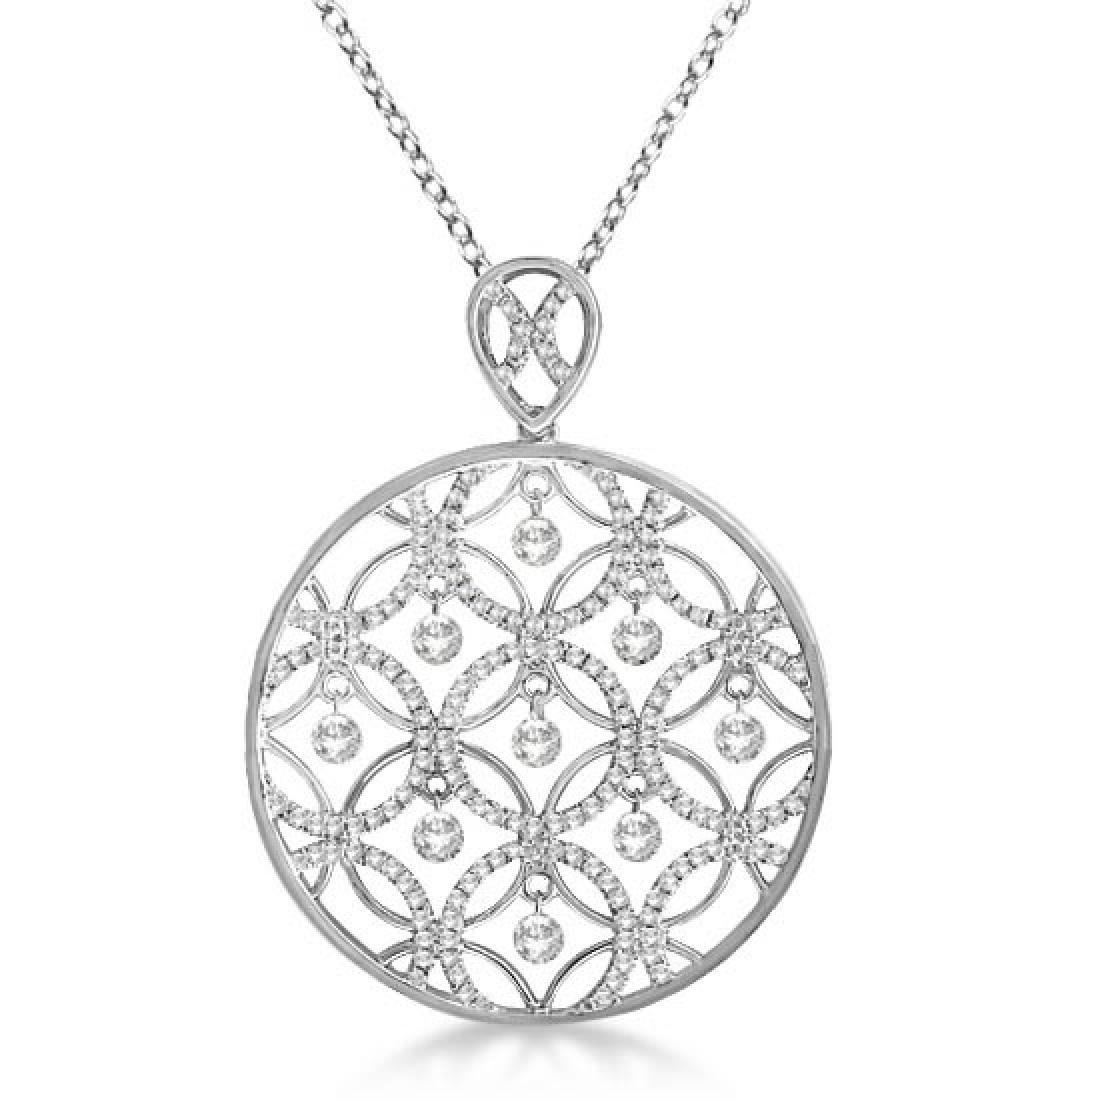 Drilled Set Diamond Circle Pendant Necklace 14k White G